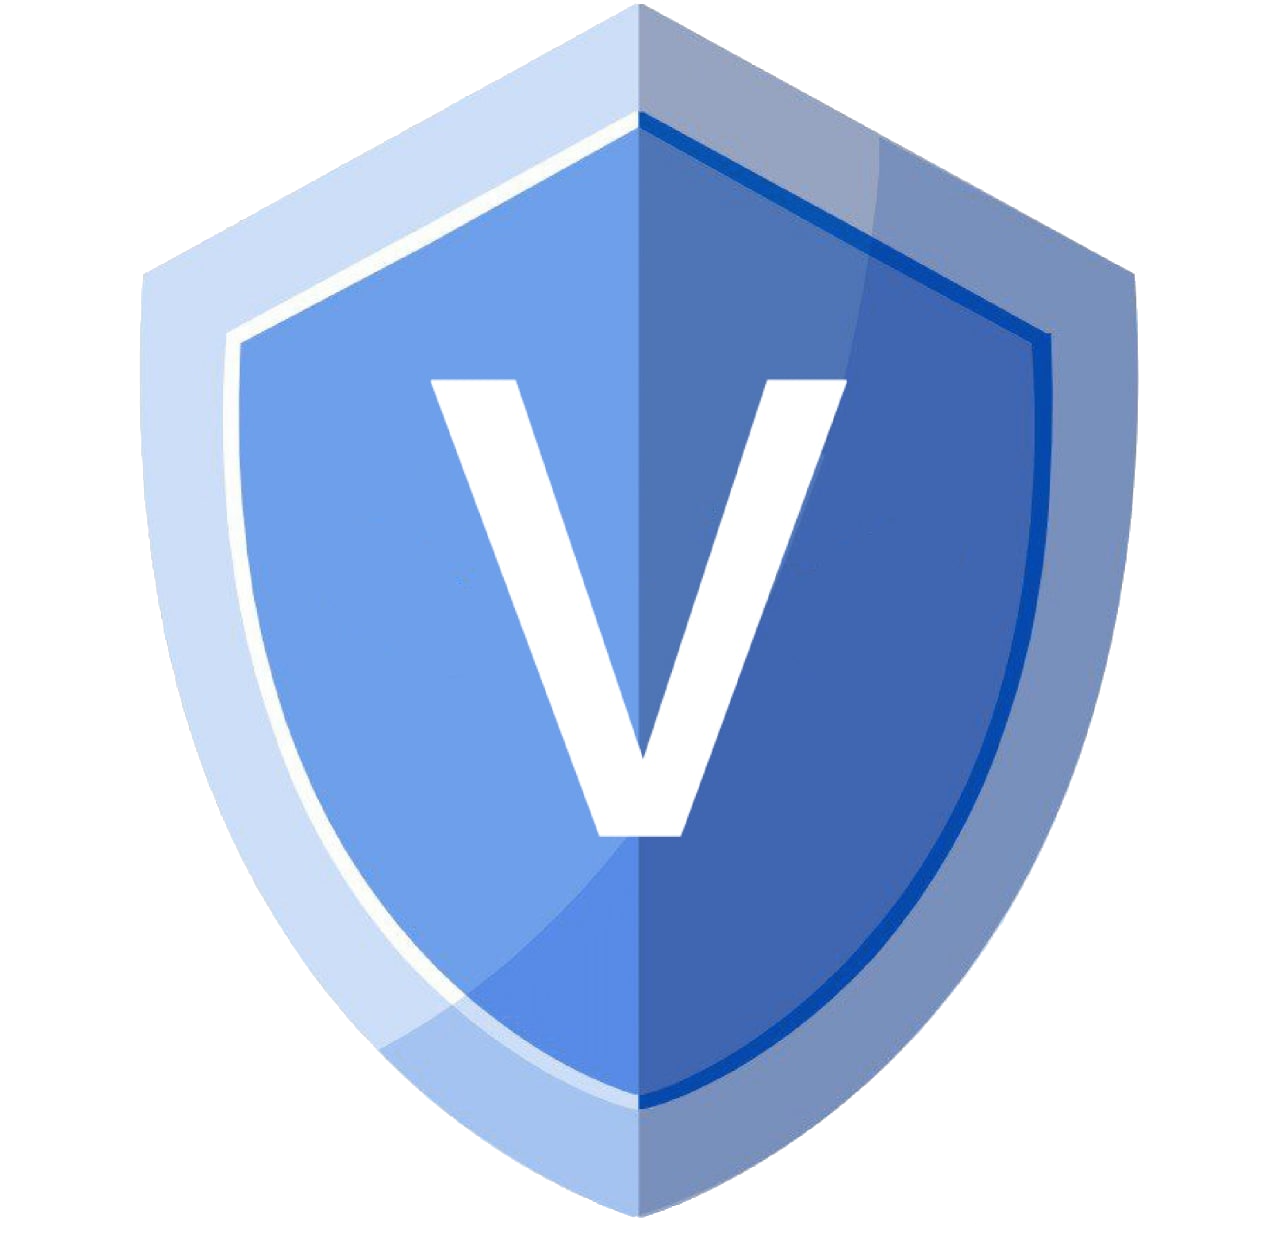 Vuollet - The nodes blockchain services and wallet app